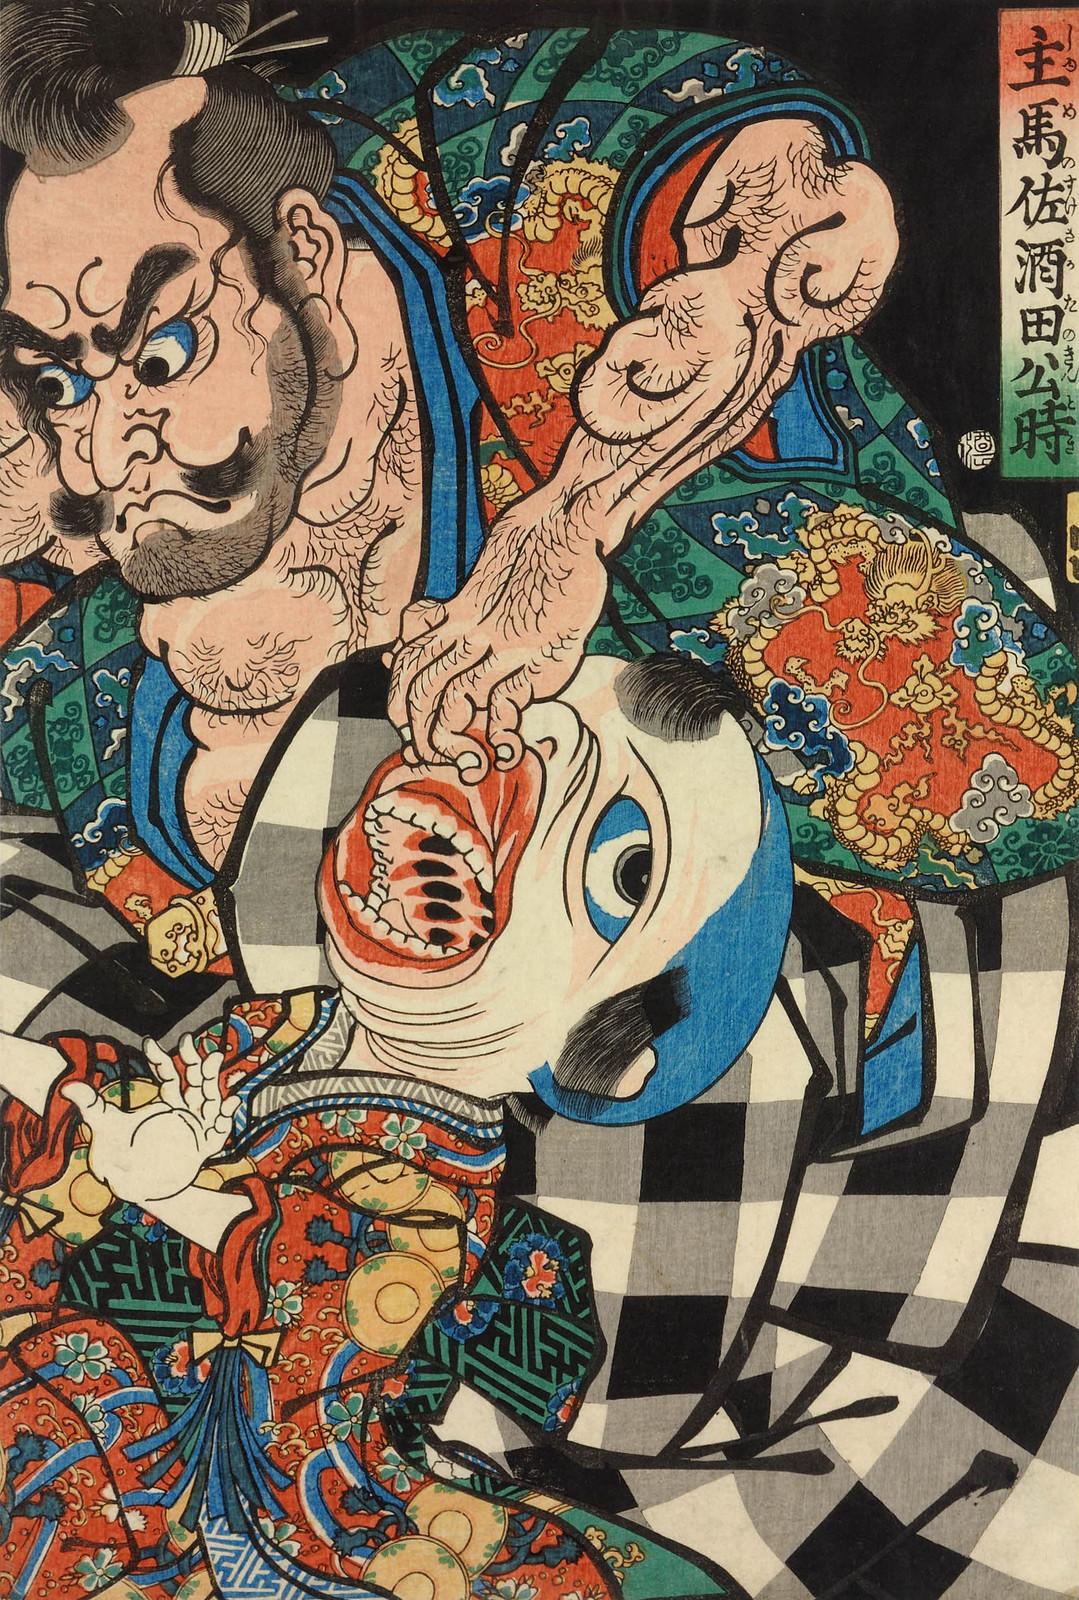 Utagawa Kuniyoshi - Raiko's retainers, Watanabe no Tonna, Sadanobu, and Kunitoki, playing go, with attempted interruptions by the Earth-Spider's demons. Edo Period (right panel)